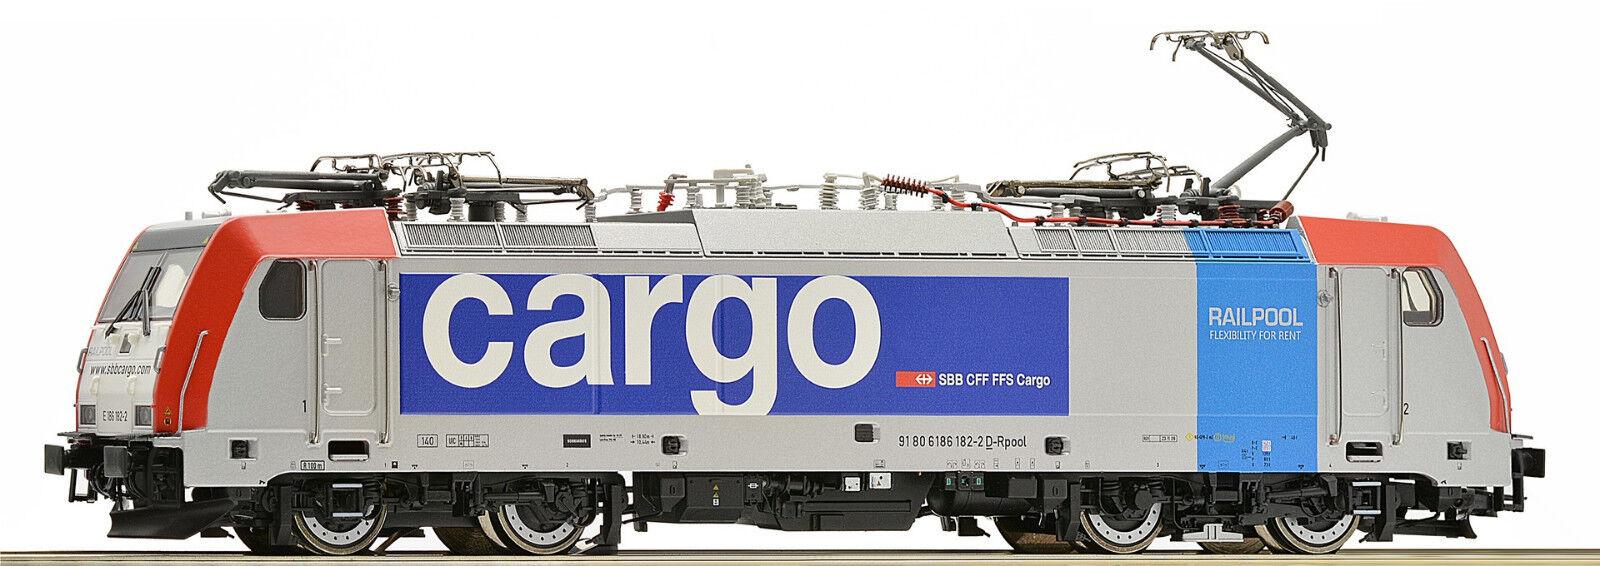 Pour märklin ROCO 79653 BR 486 SBB cargo Railpool Ep VI mfx possible